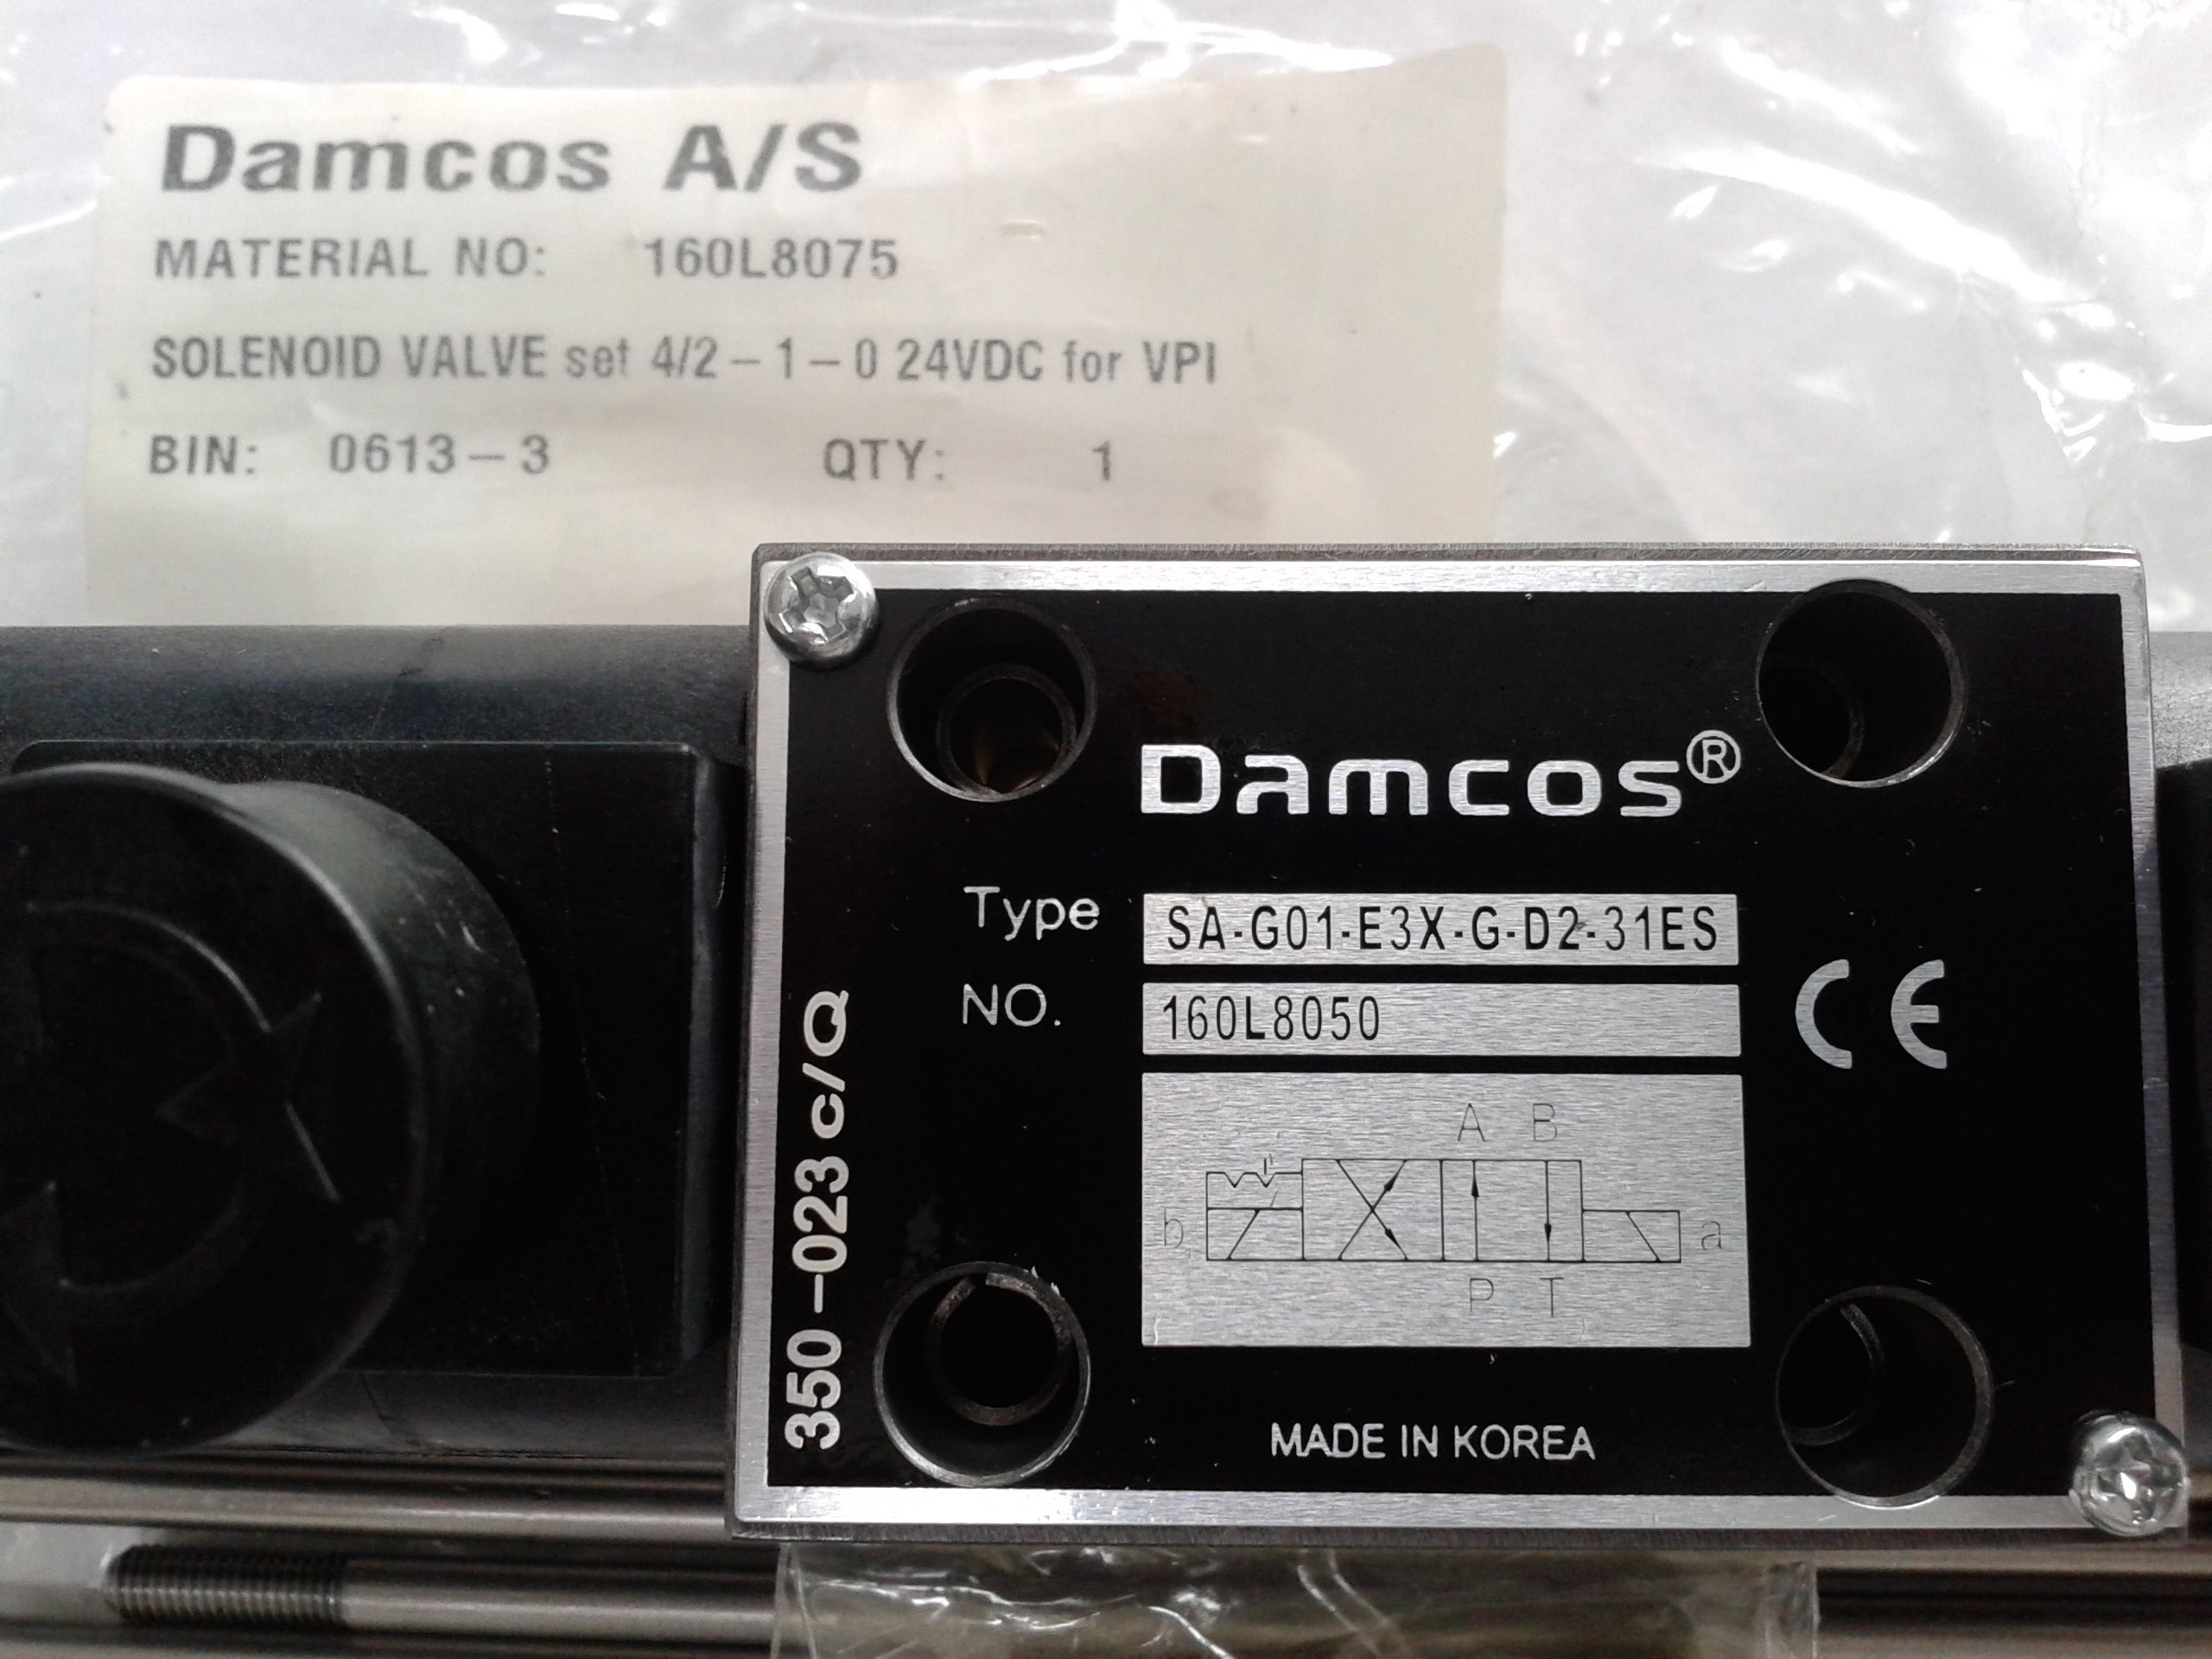 Damcos : Danfoss Solenoid Valve 160L8050 (160L8075)